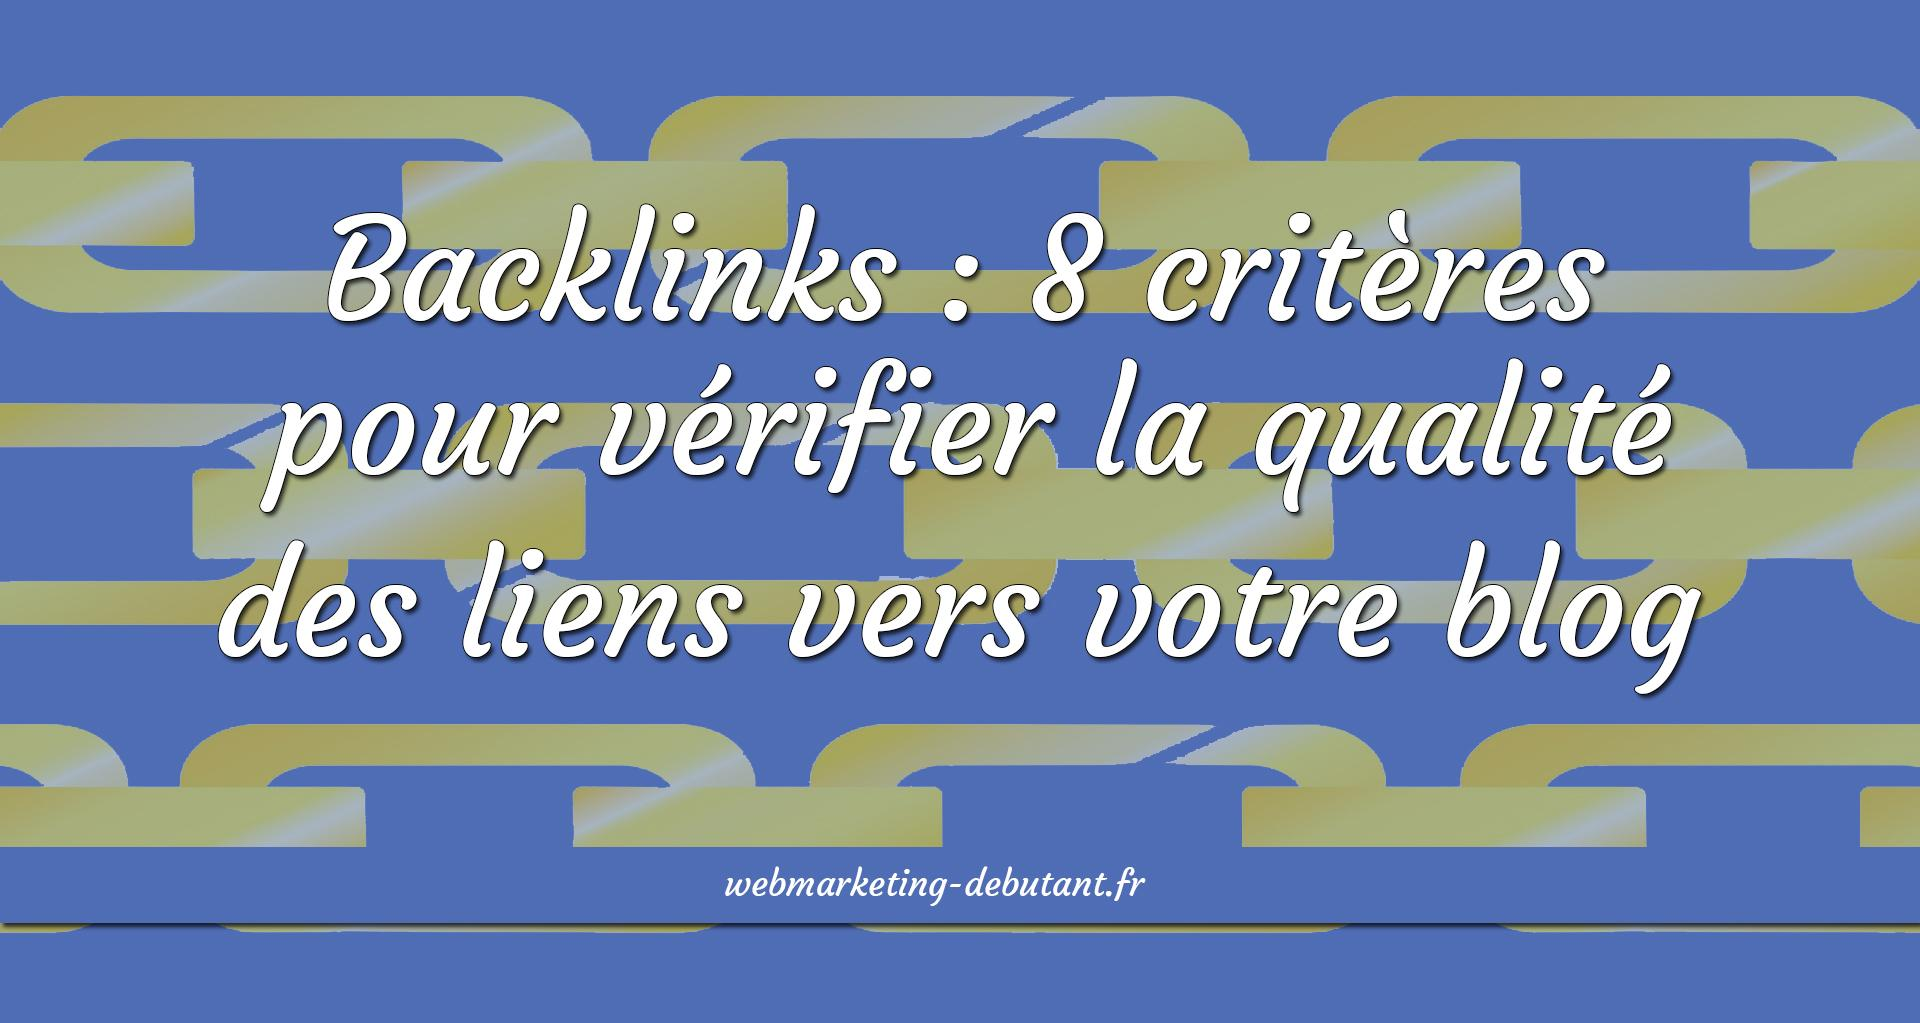 baklinks